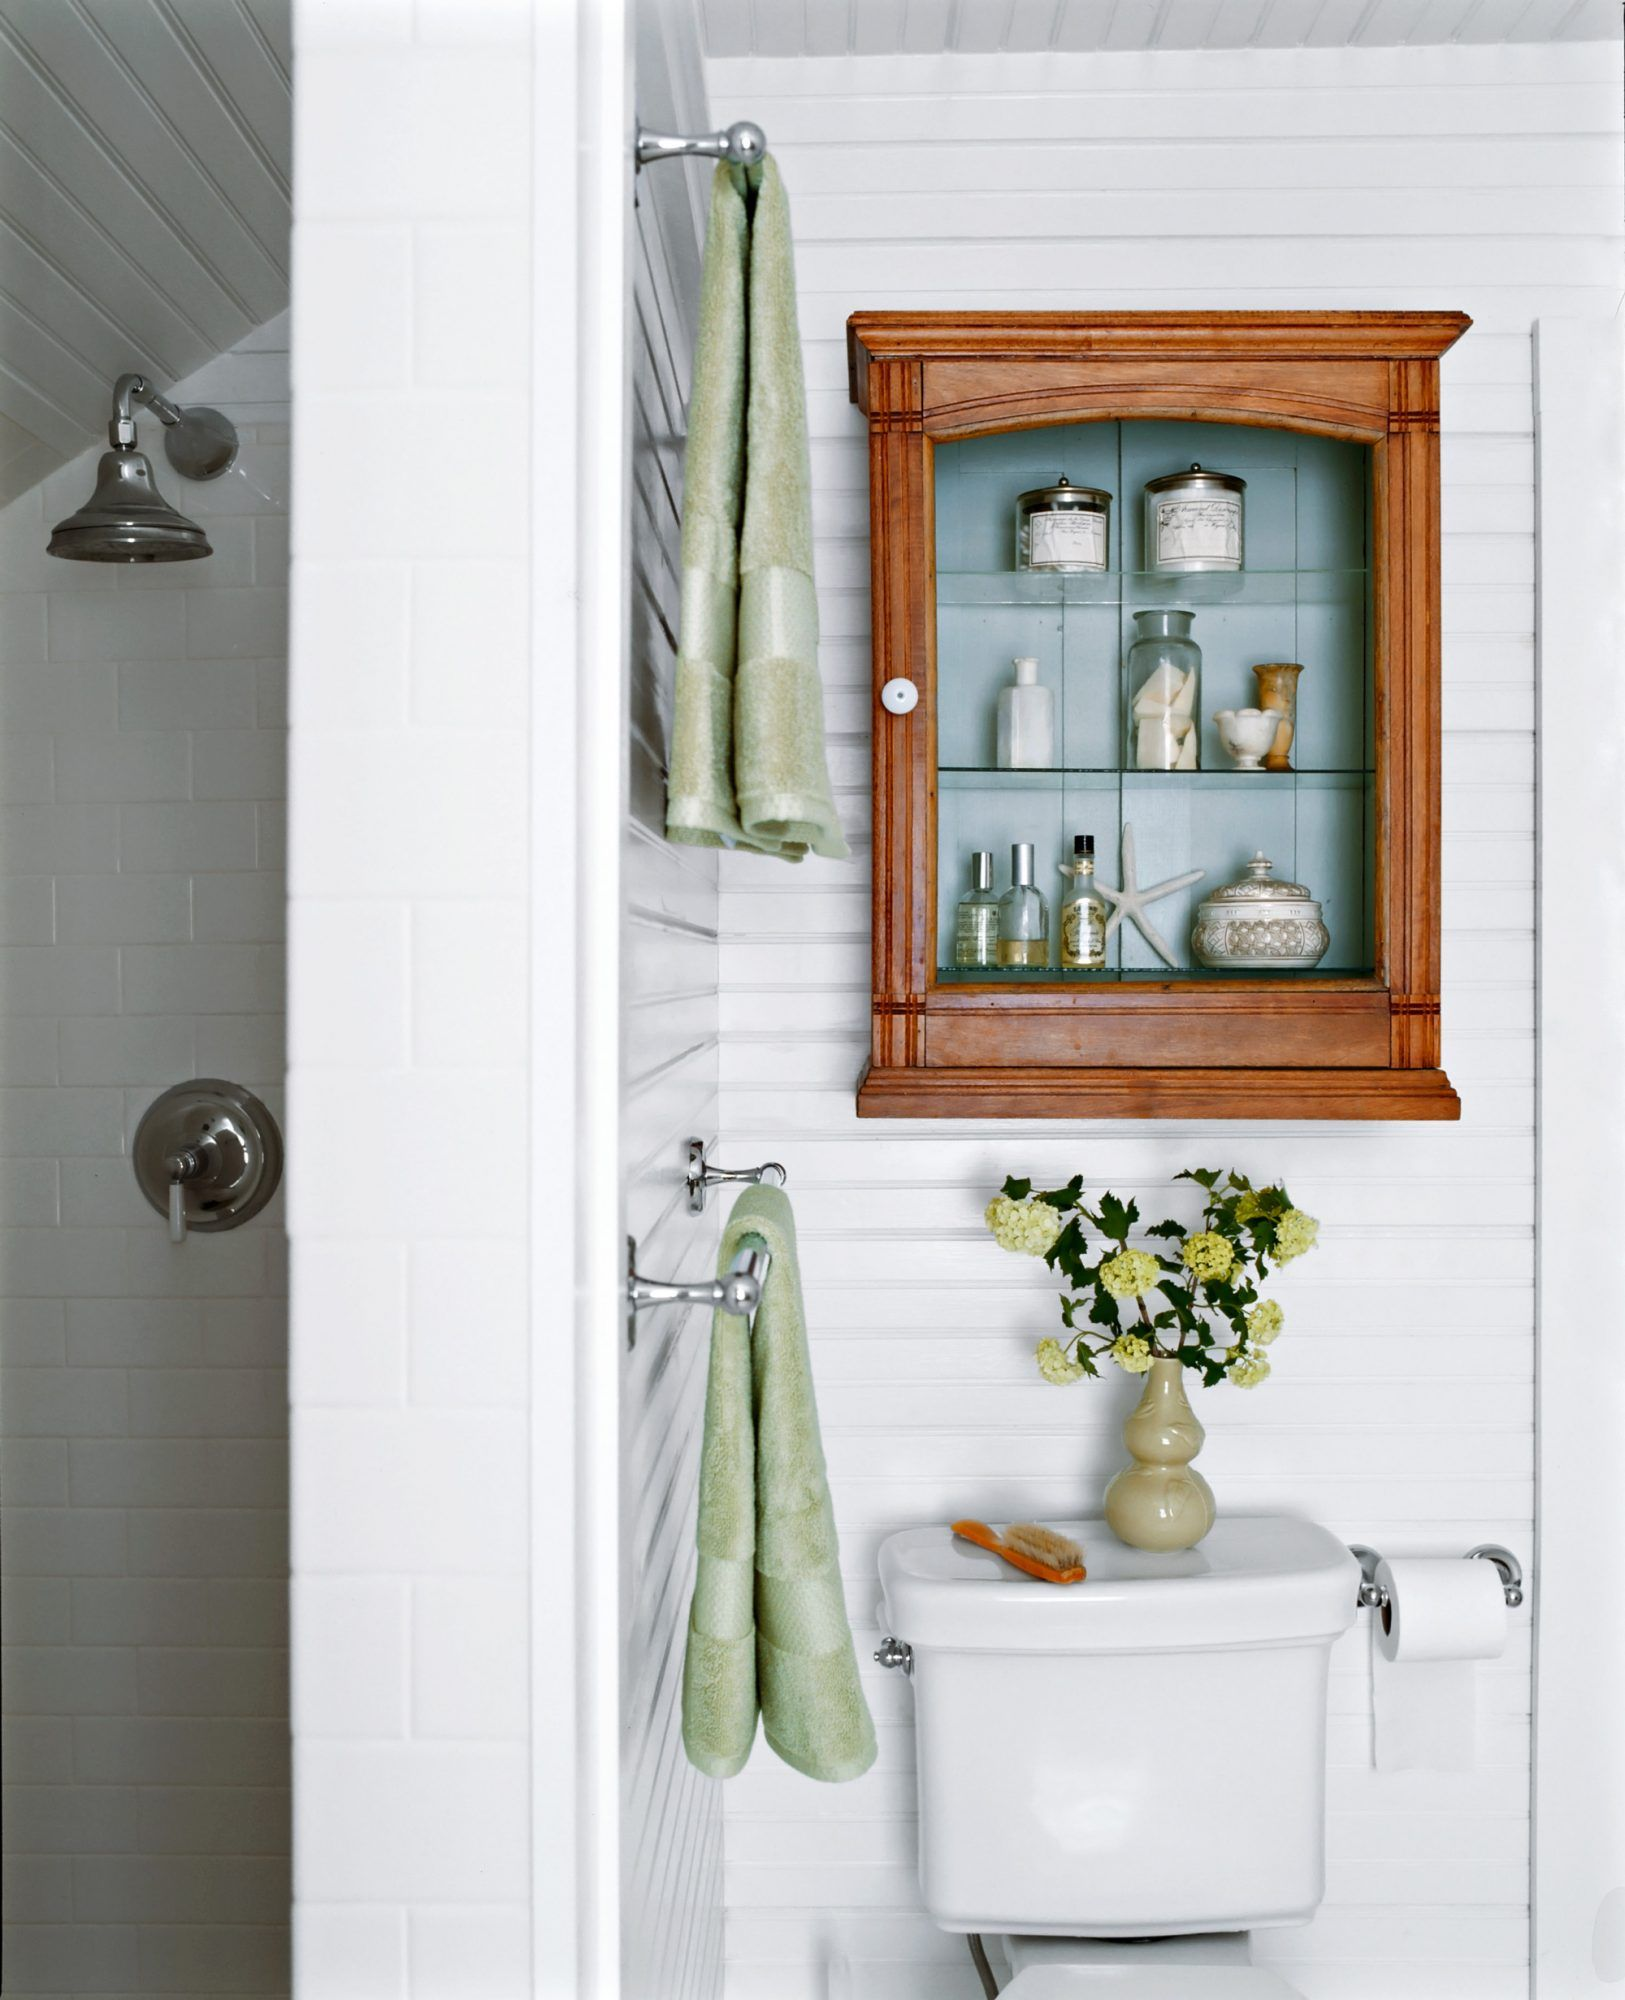 28 Towel Display Ideas For Pretty And Practical Bathroom Storage In 2020 Small Bathroom Bathroom Design Small Bathroom Towels Display